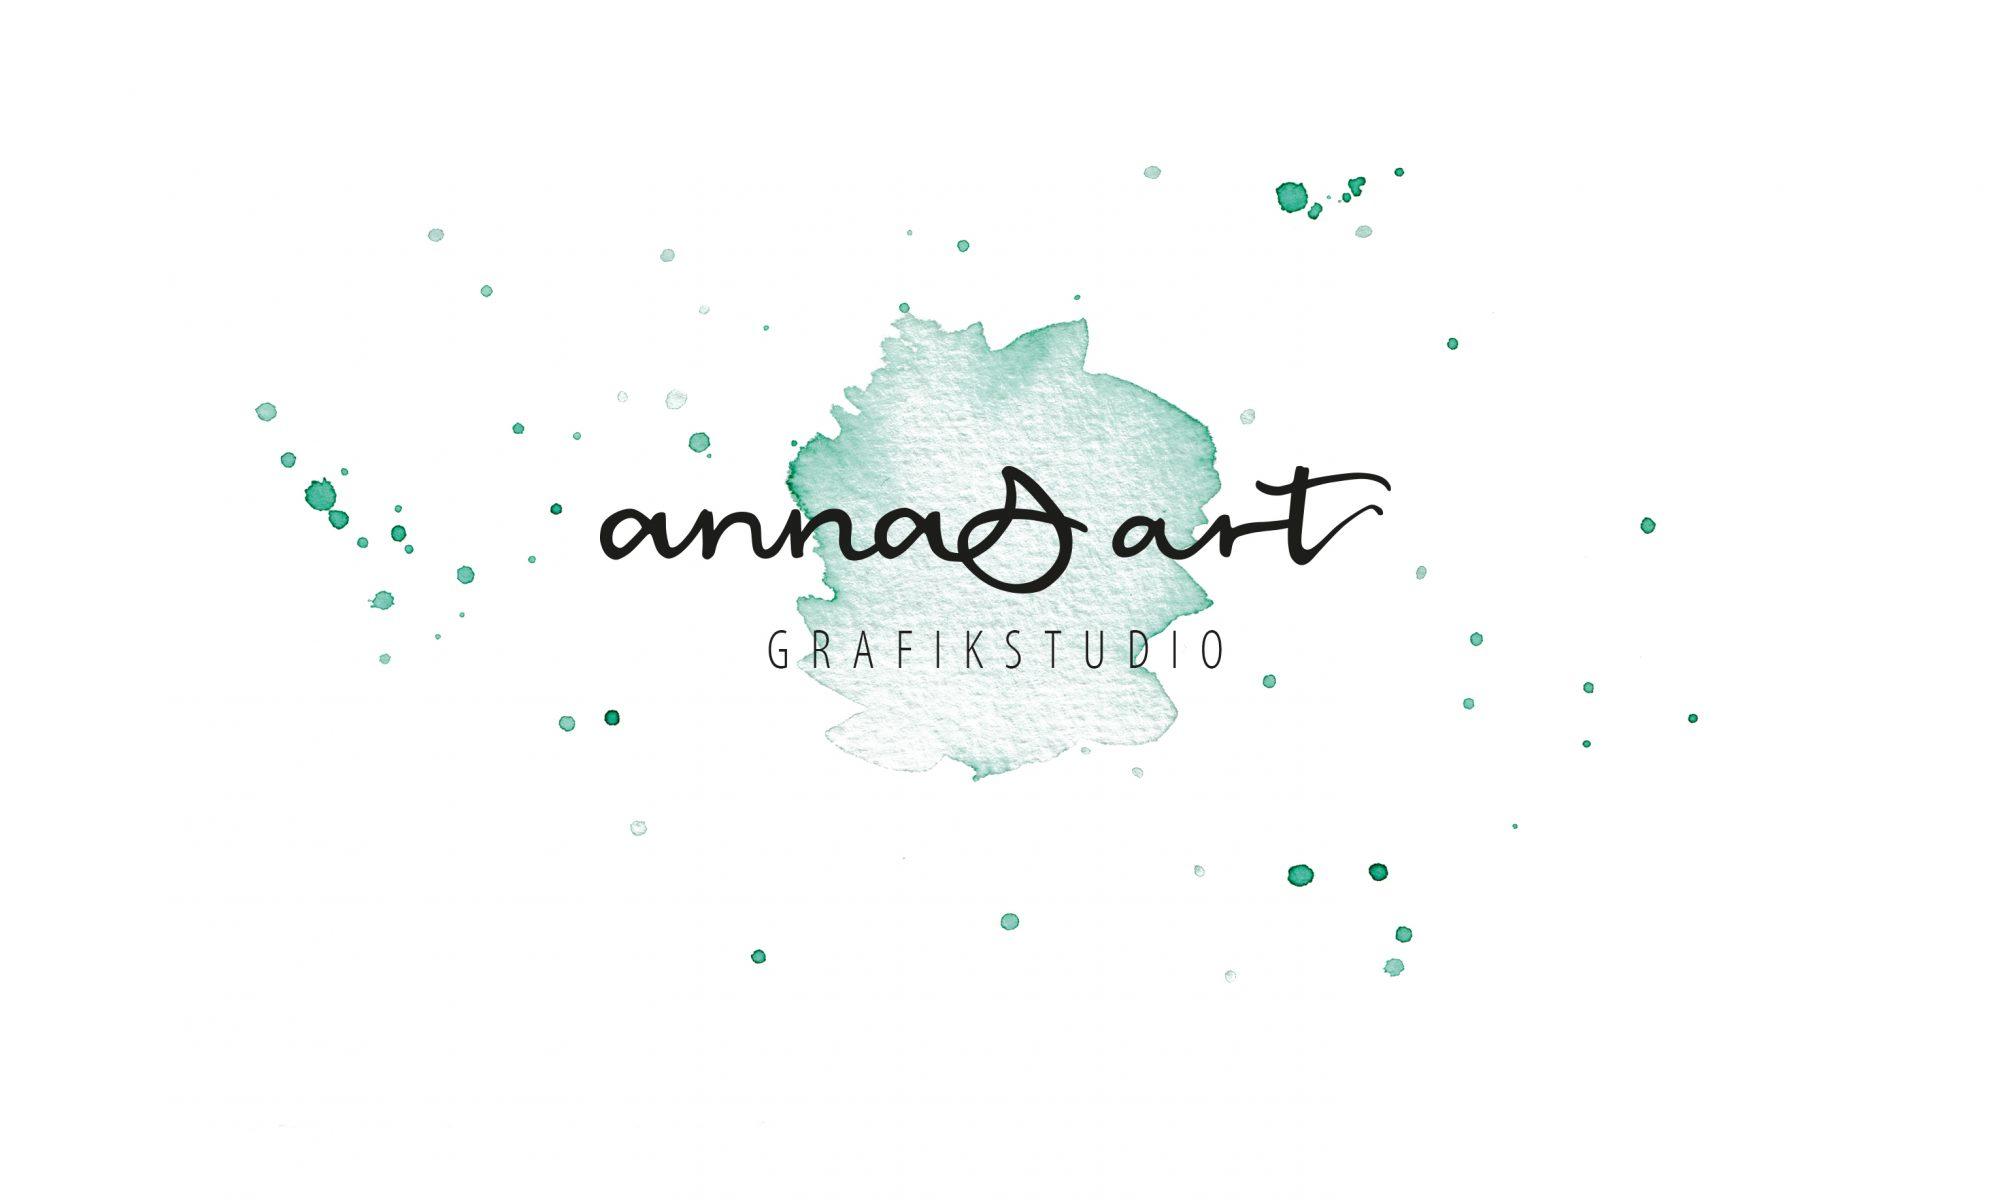 AnnasArt Grafikstudio